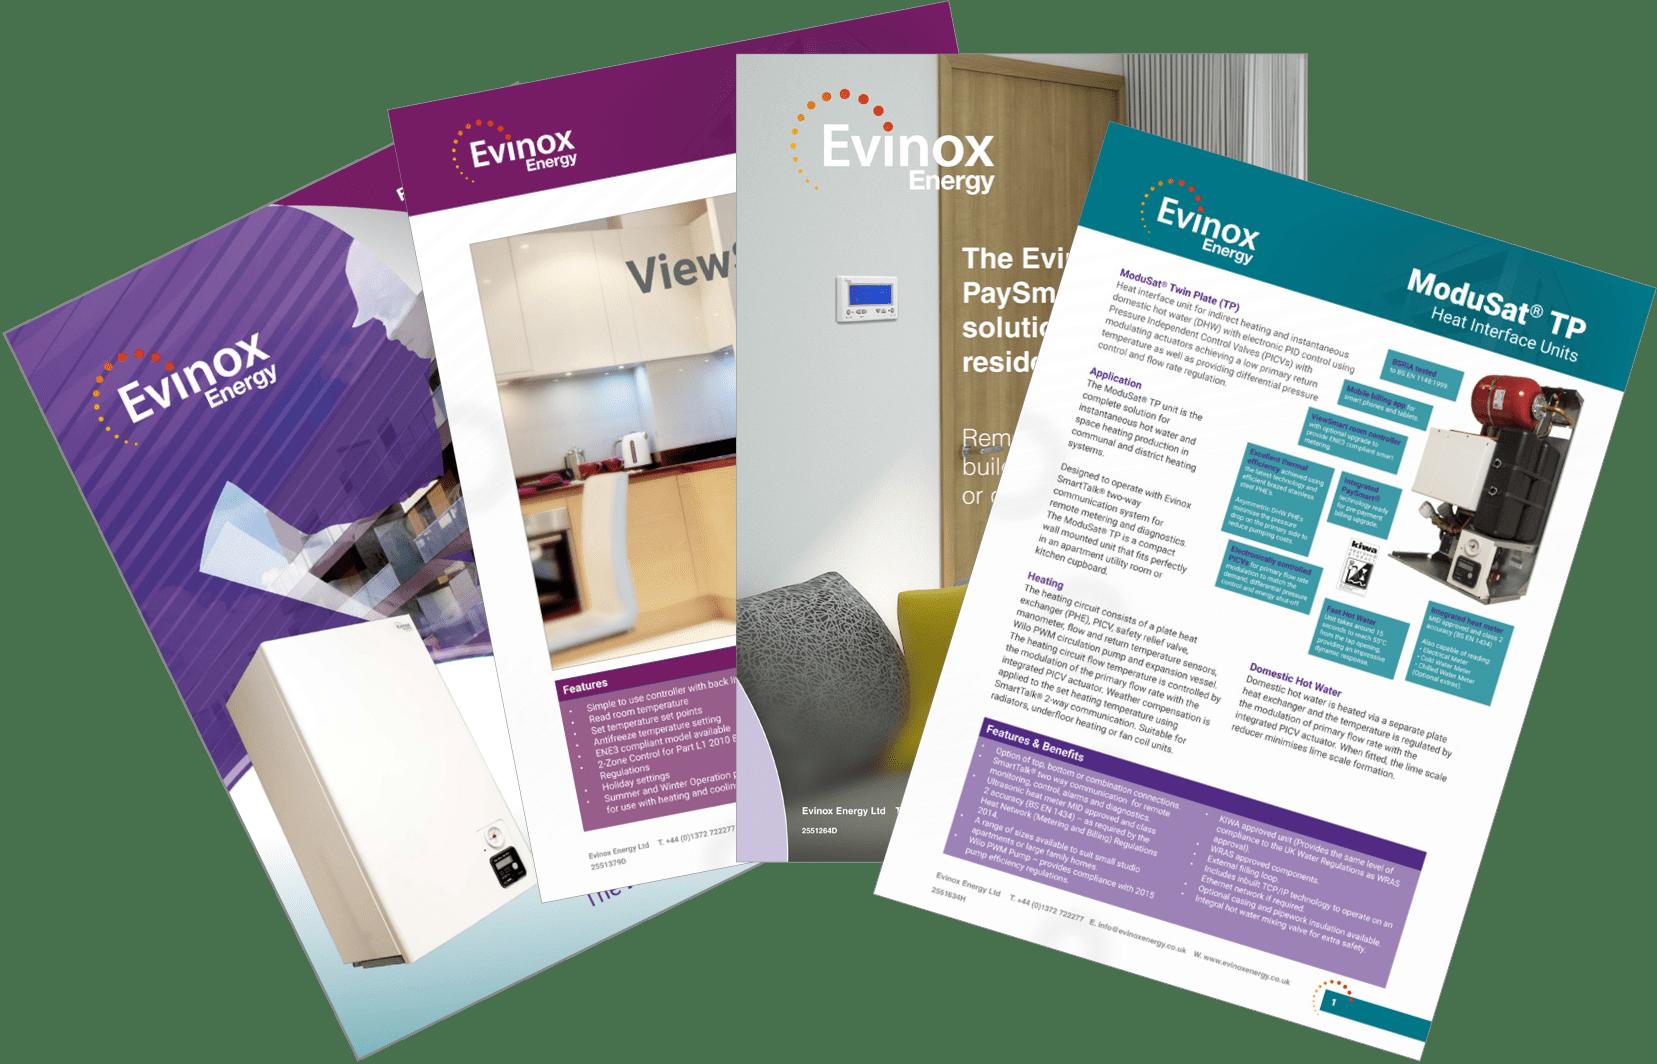 Evinox brochure image